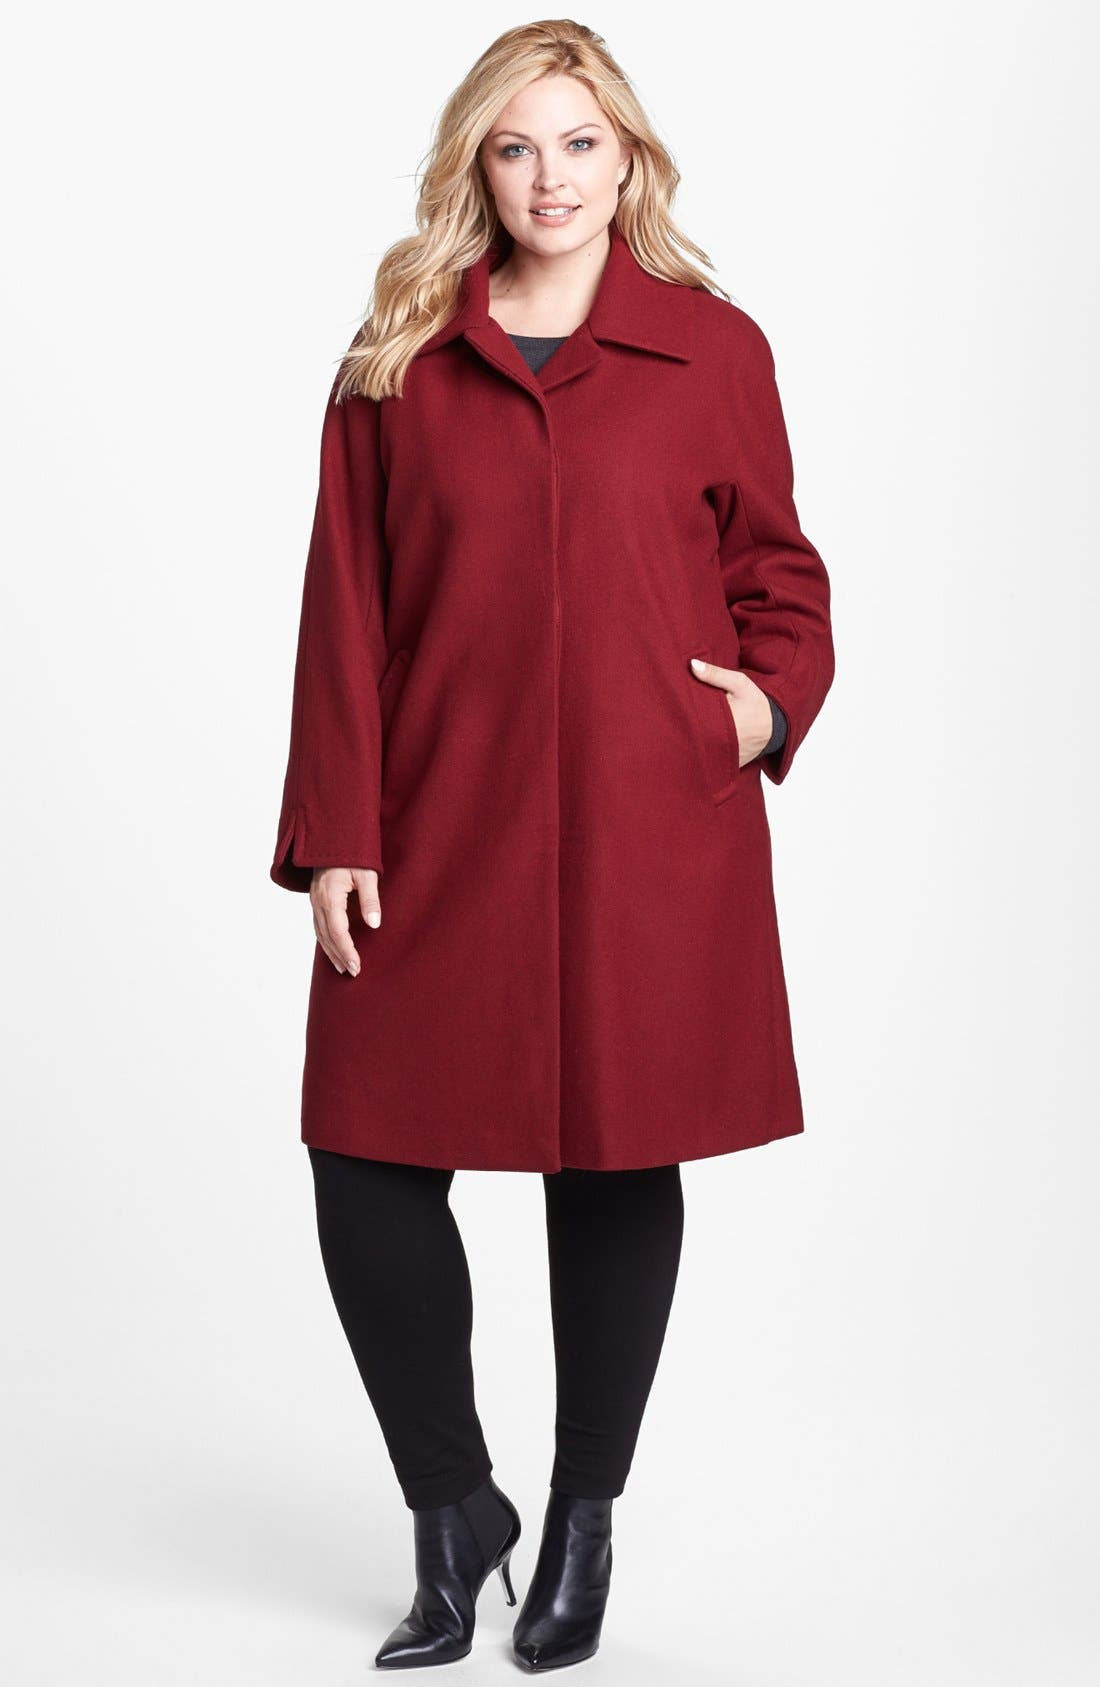 Alternate Image 1 Selected - Ellen Tracy 'Clutch' Coat (Plus Size)